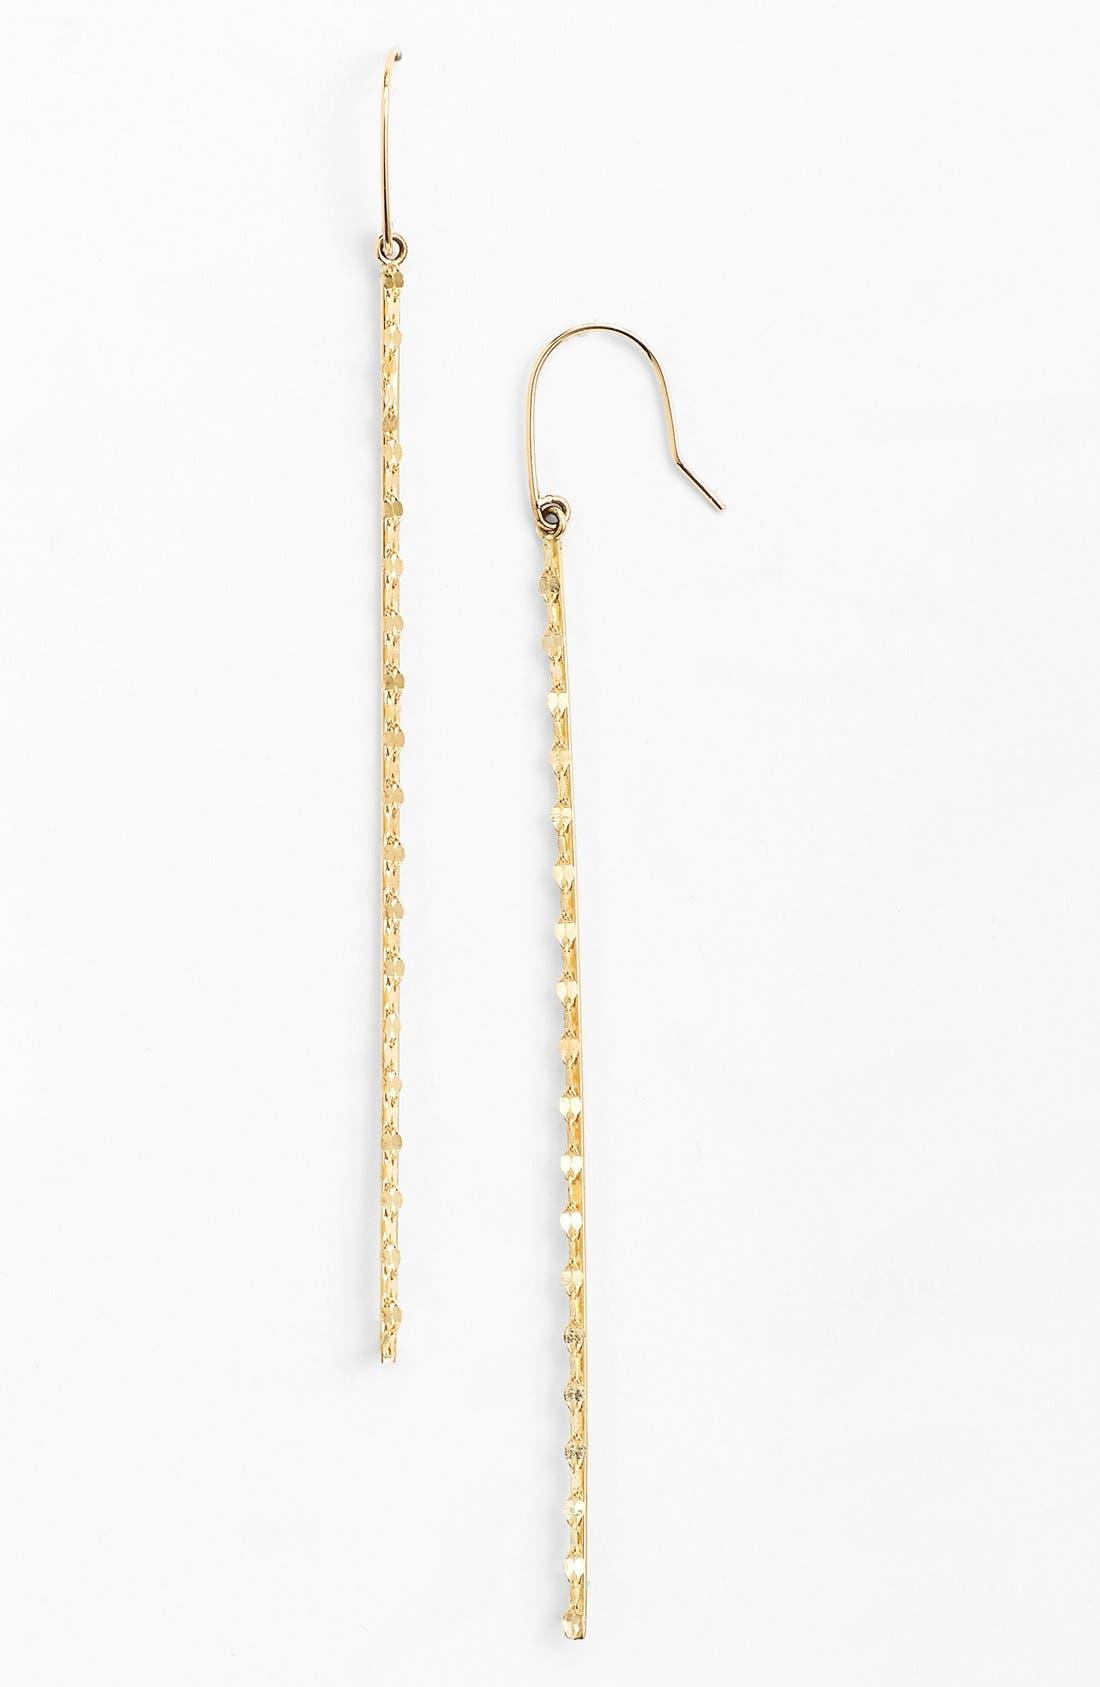 'Glam' Long Linear Earrings,                             Main thumbnail 1, color,                             710